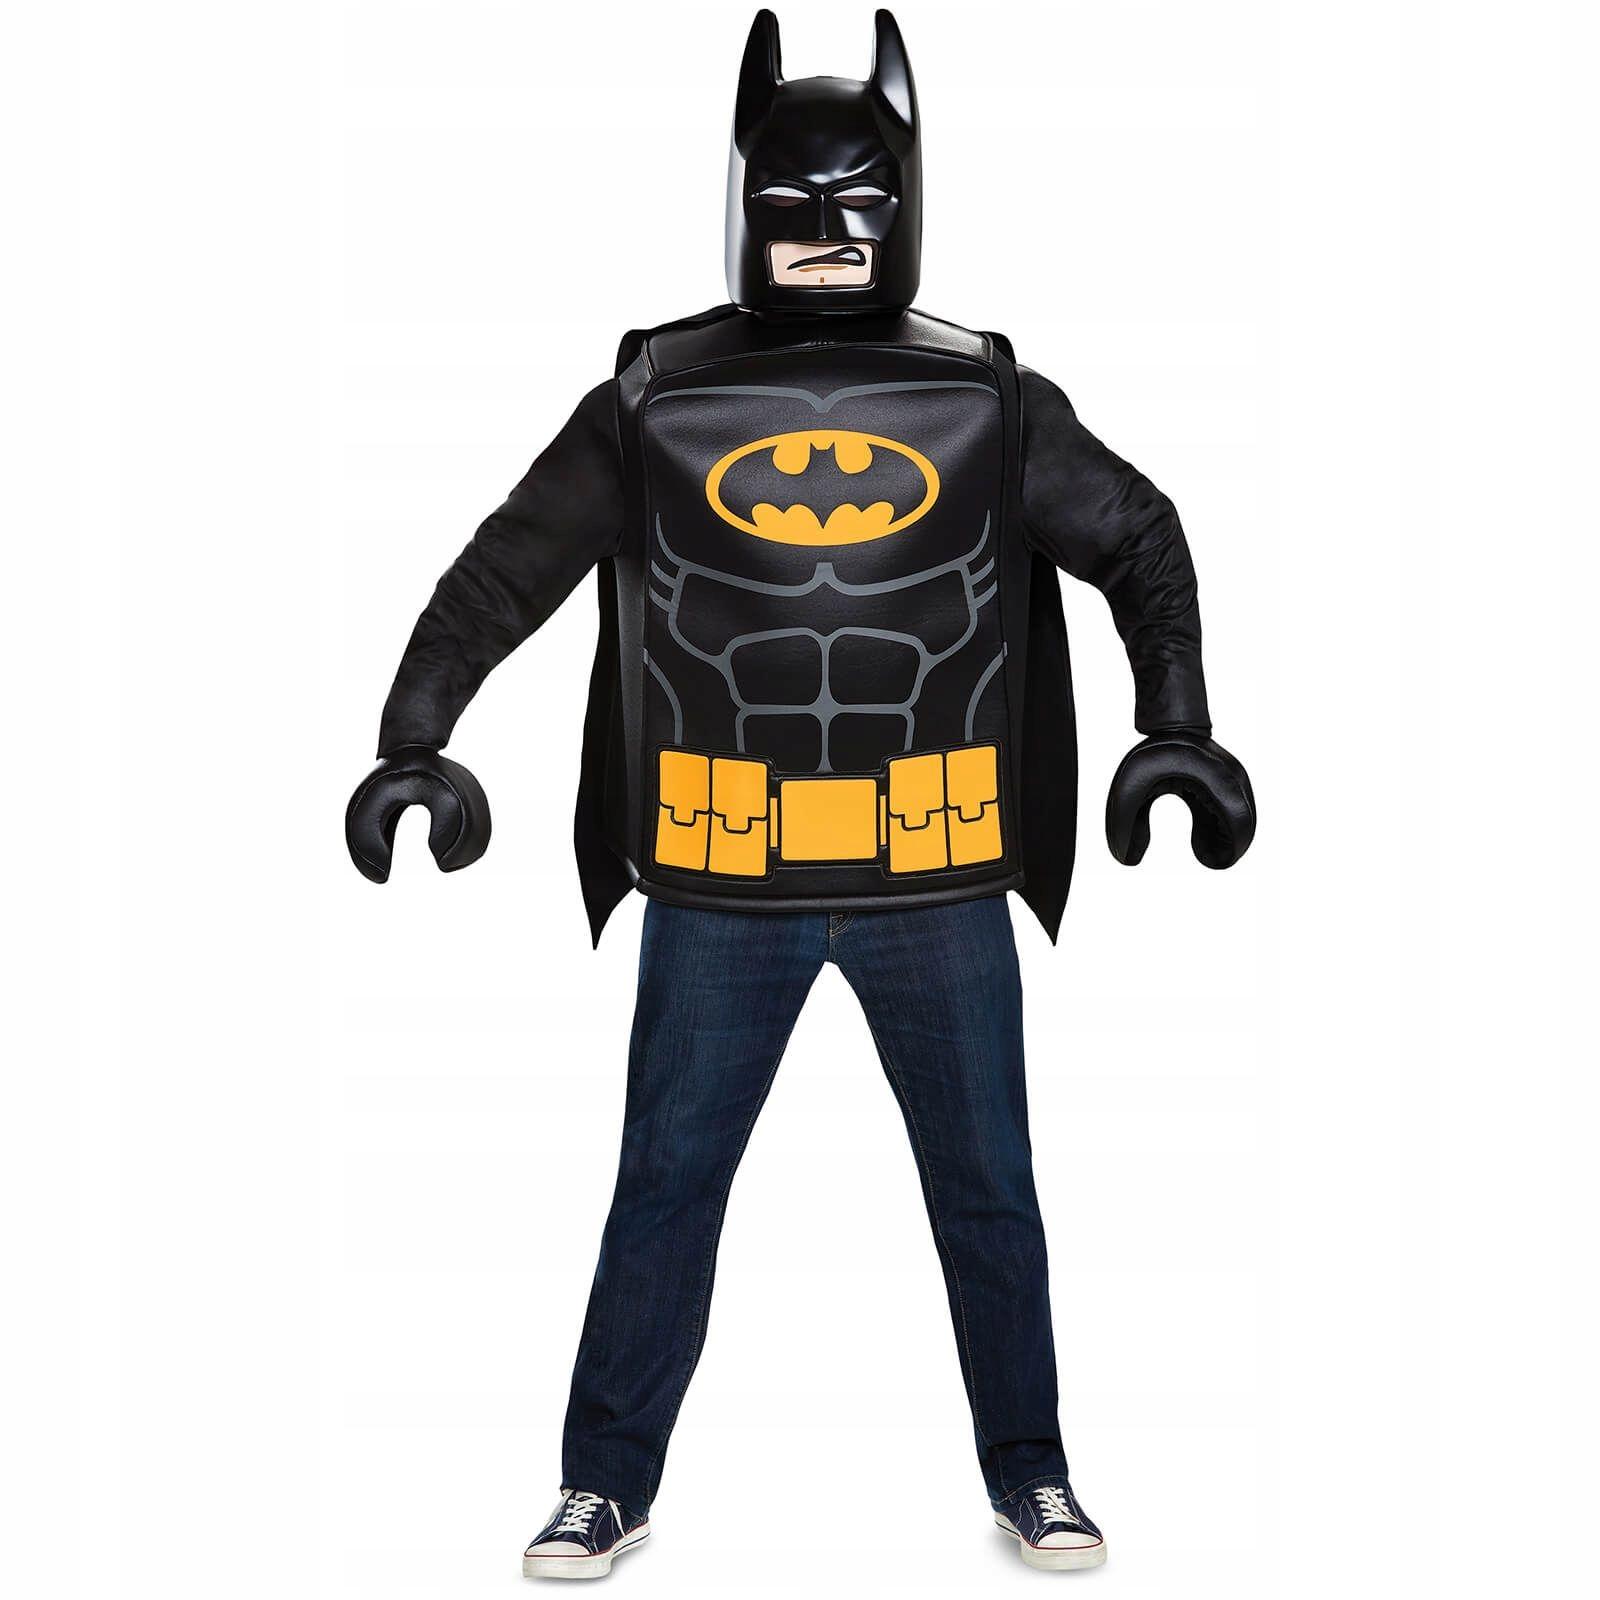 KOSTIUM LEGO BATMAN MASKA RĘKAWICE DELUX 7-8 24h